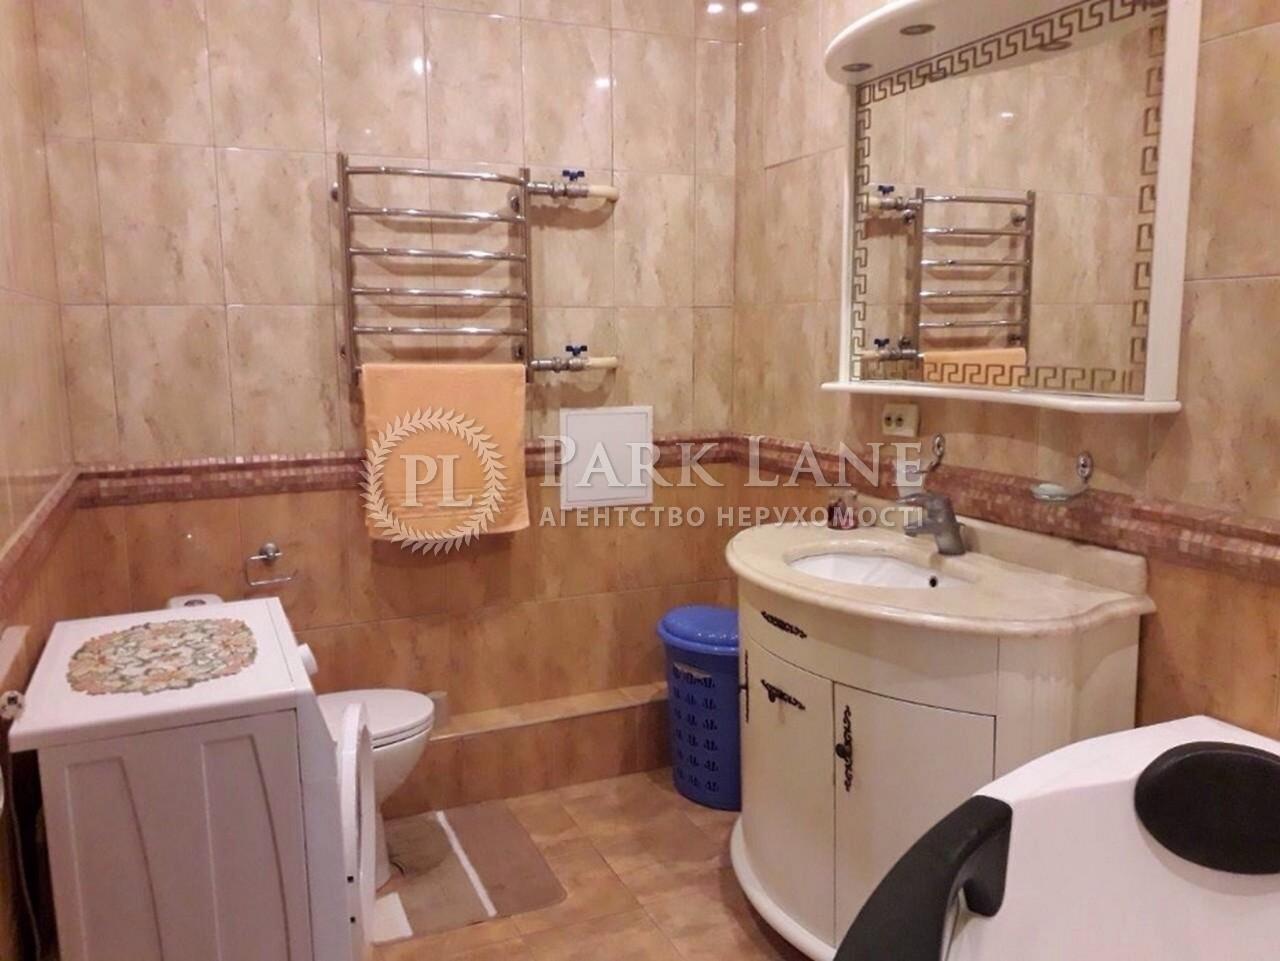 Квартира ул. Драгоманова, 1а, Киев, Z-384557 - Фото 4